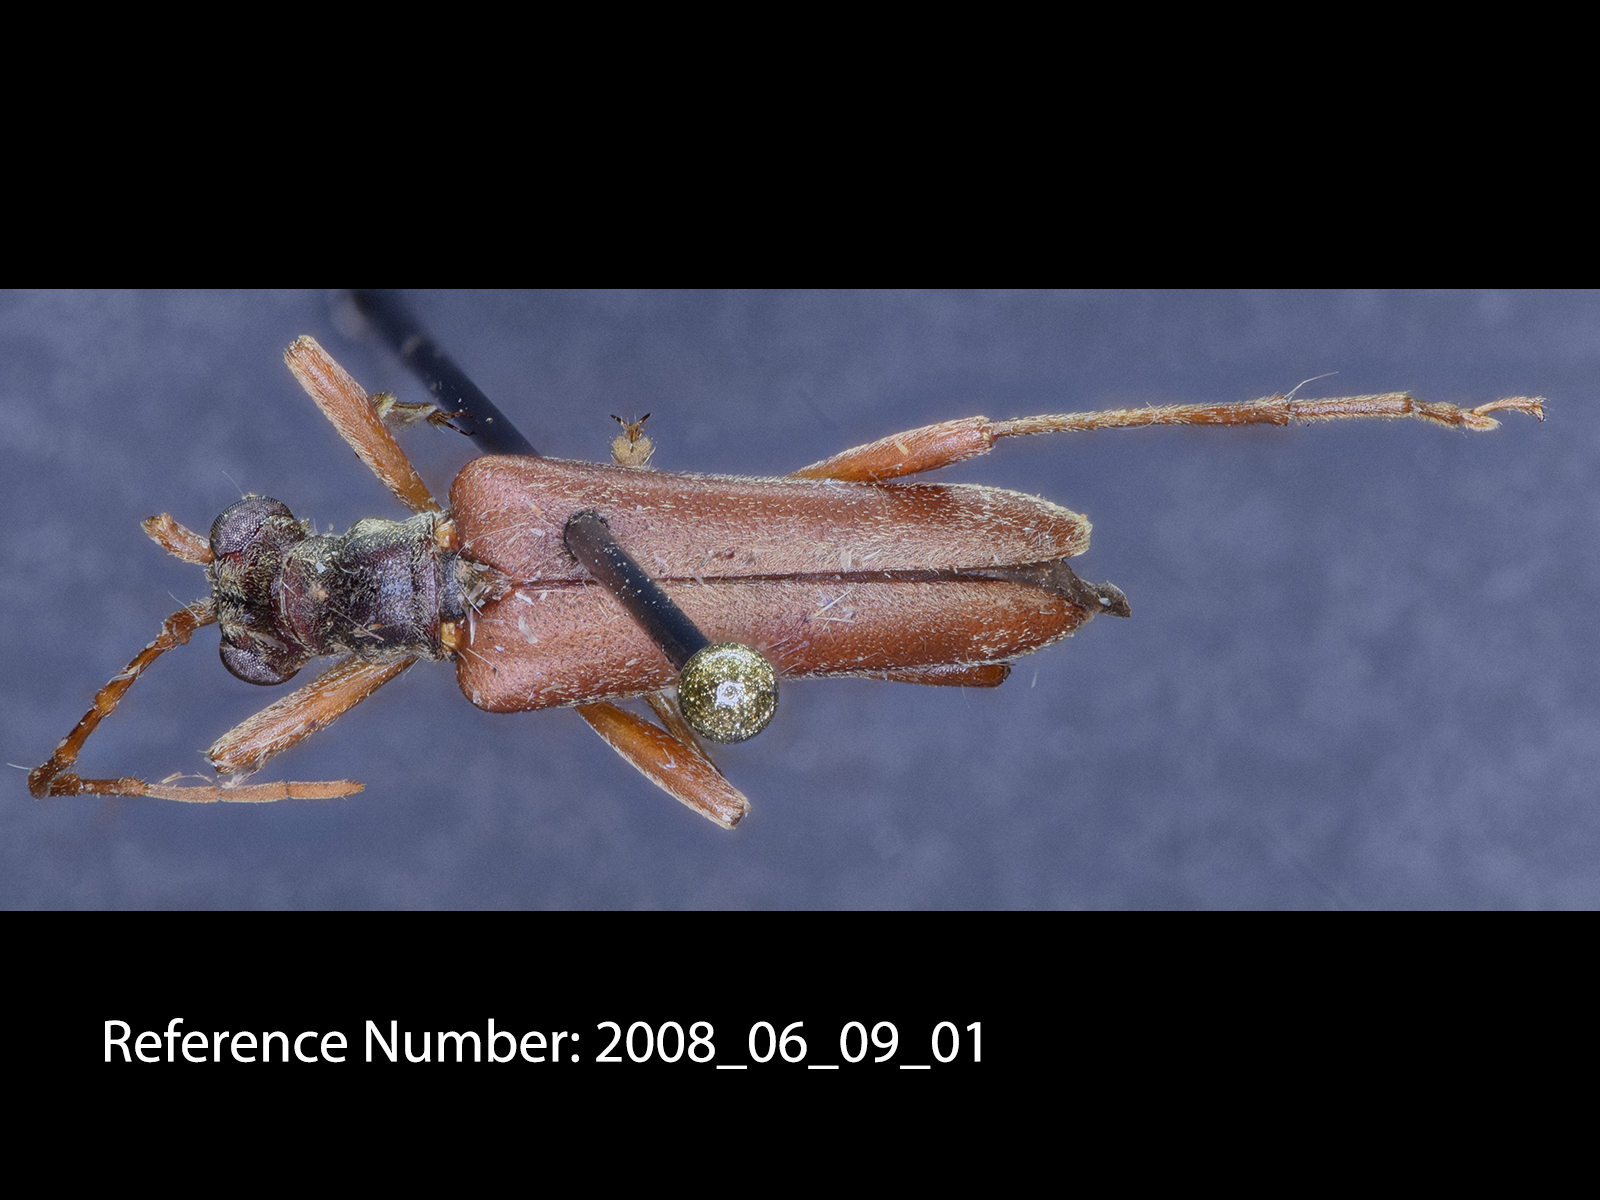 Stenocorus cinnamopterus dorsal view